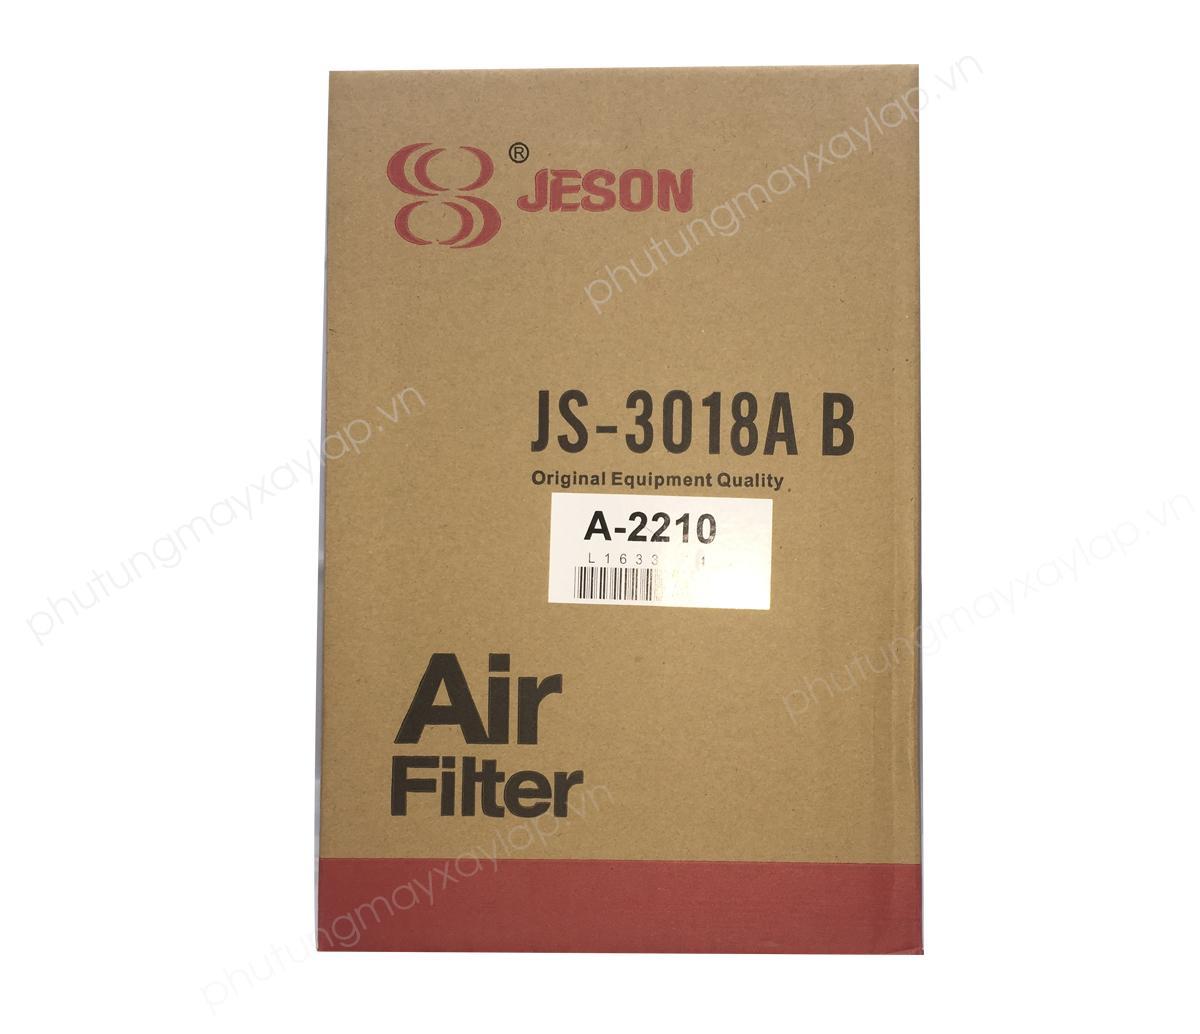 Lọc gió JS3018A-A2210/A6117-S